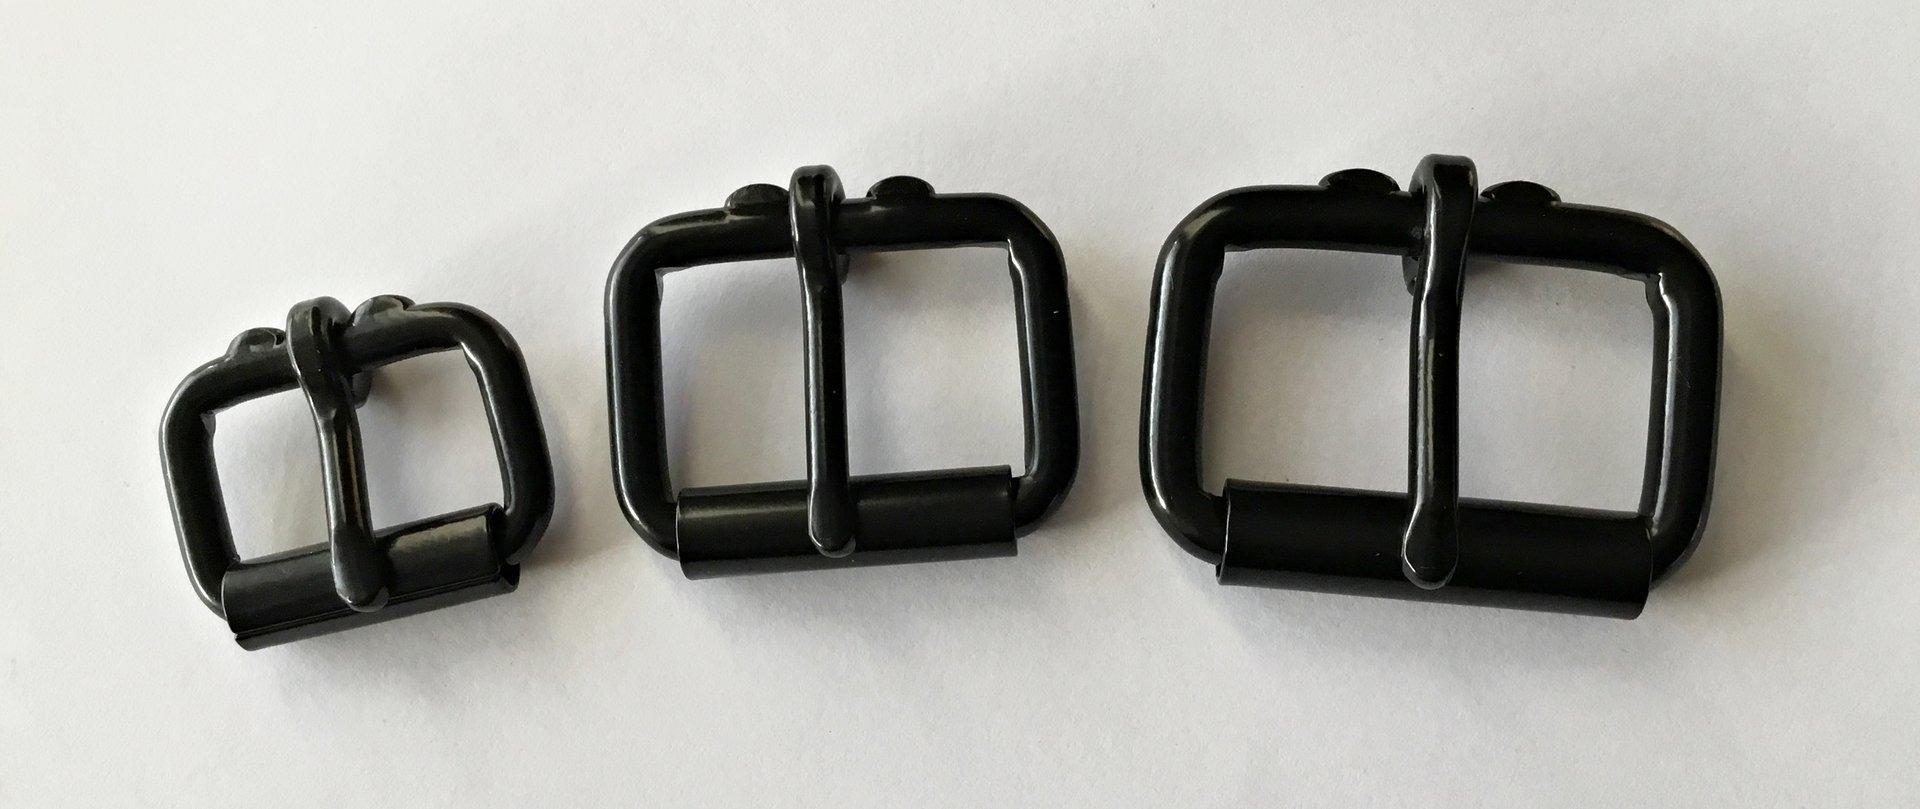 5 x Rundringe,schwarz galvanisiert 1 ca.25x4,5mm geschweißt